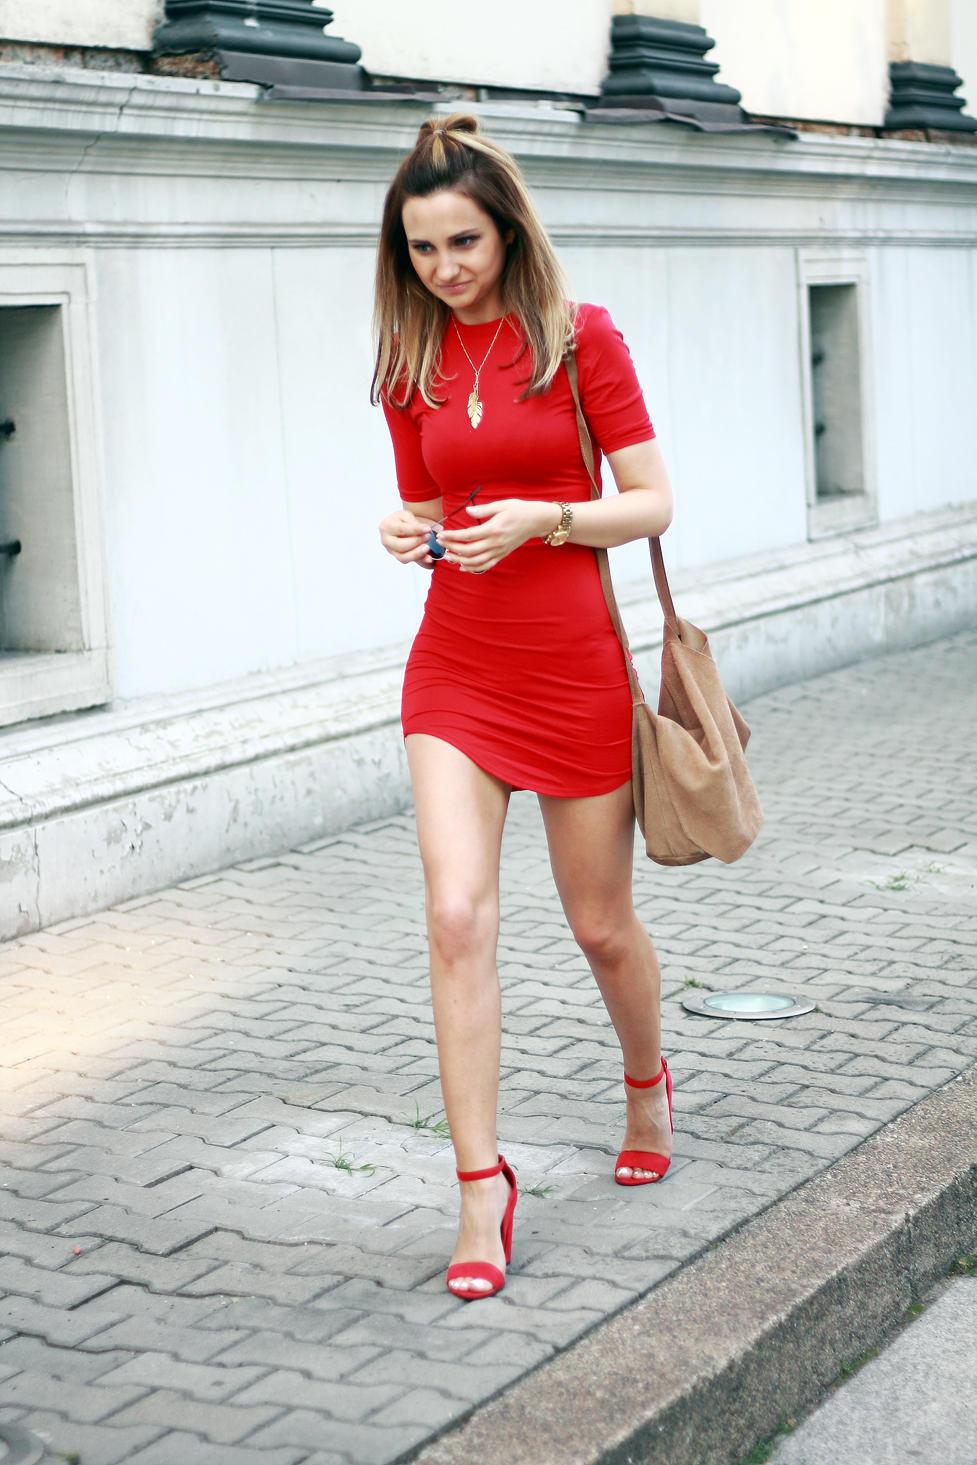 c15397f24b76 street-style-fashion-red-dress-heels-blonde-girl-